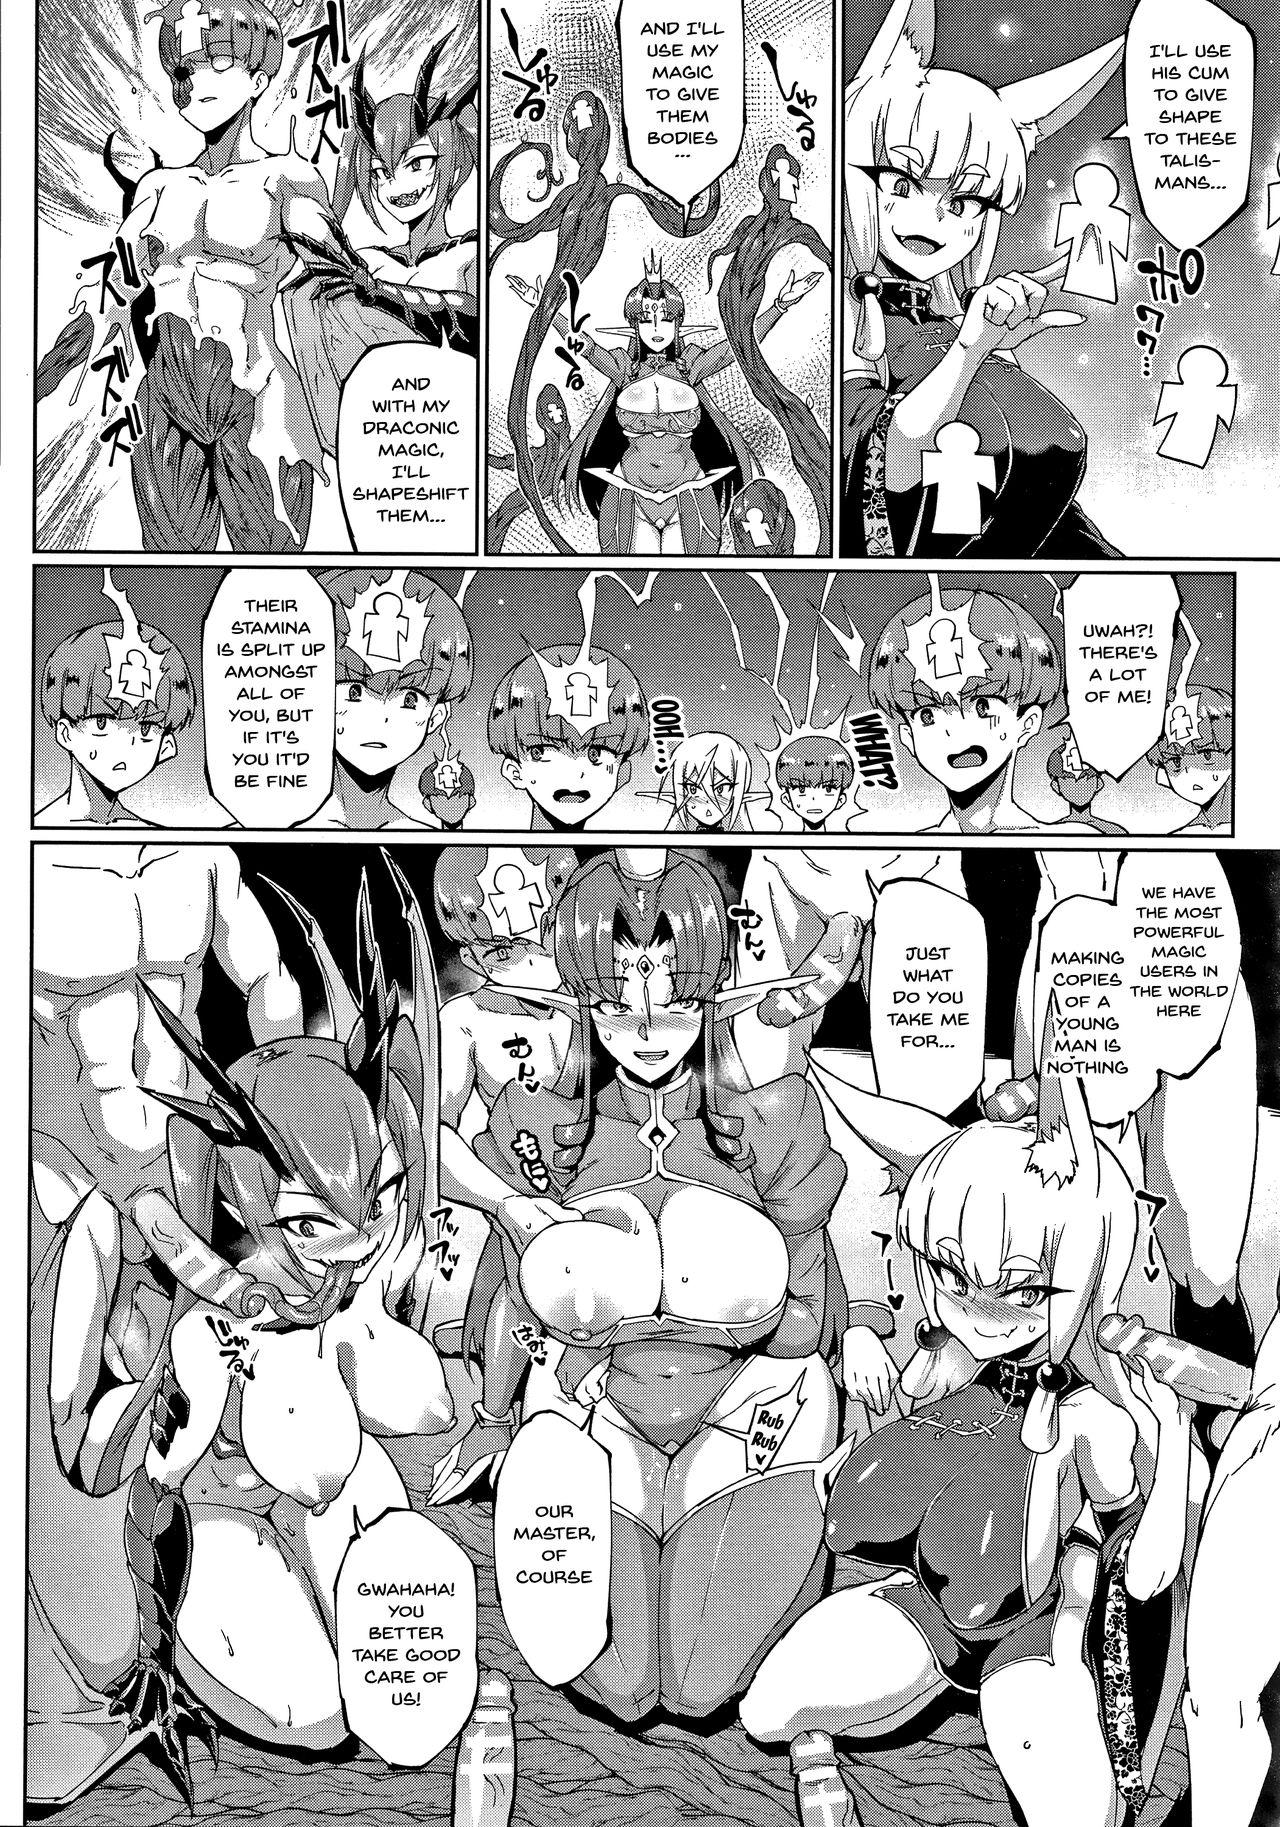 [Fan no Hitori] Sennen Reijou ~My Lady, My Master~  Ch.1-6 [English] {Doujins.com} 110